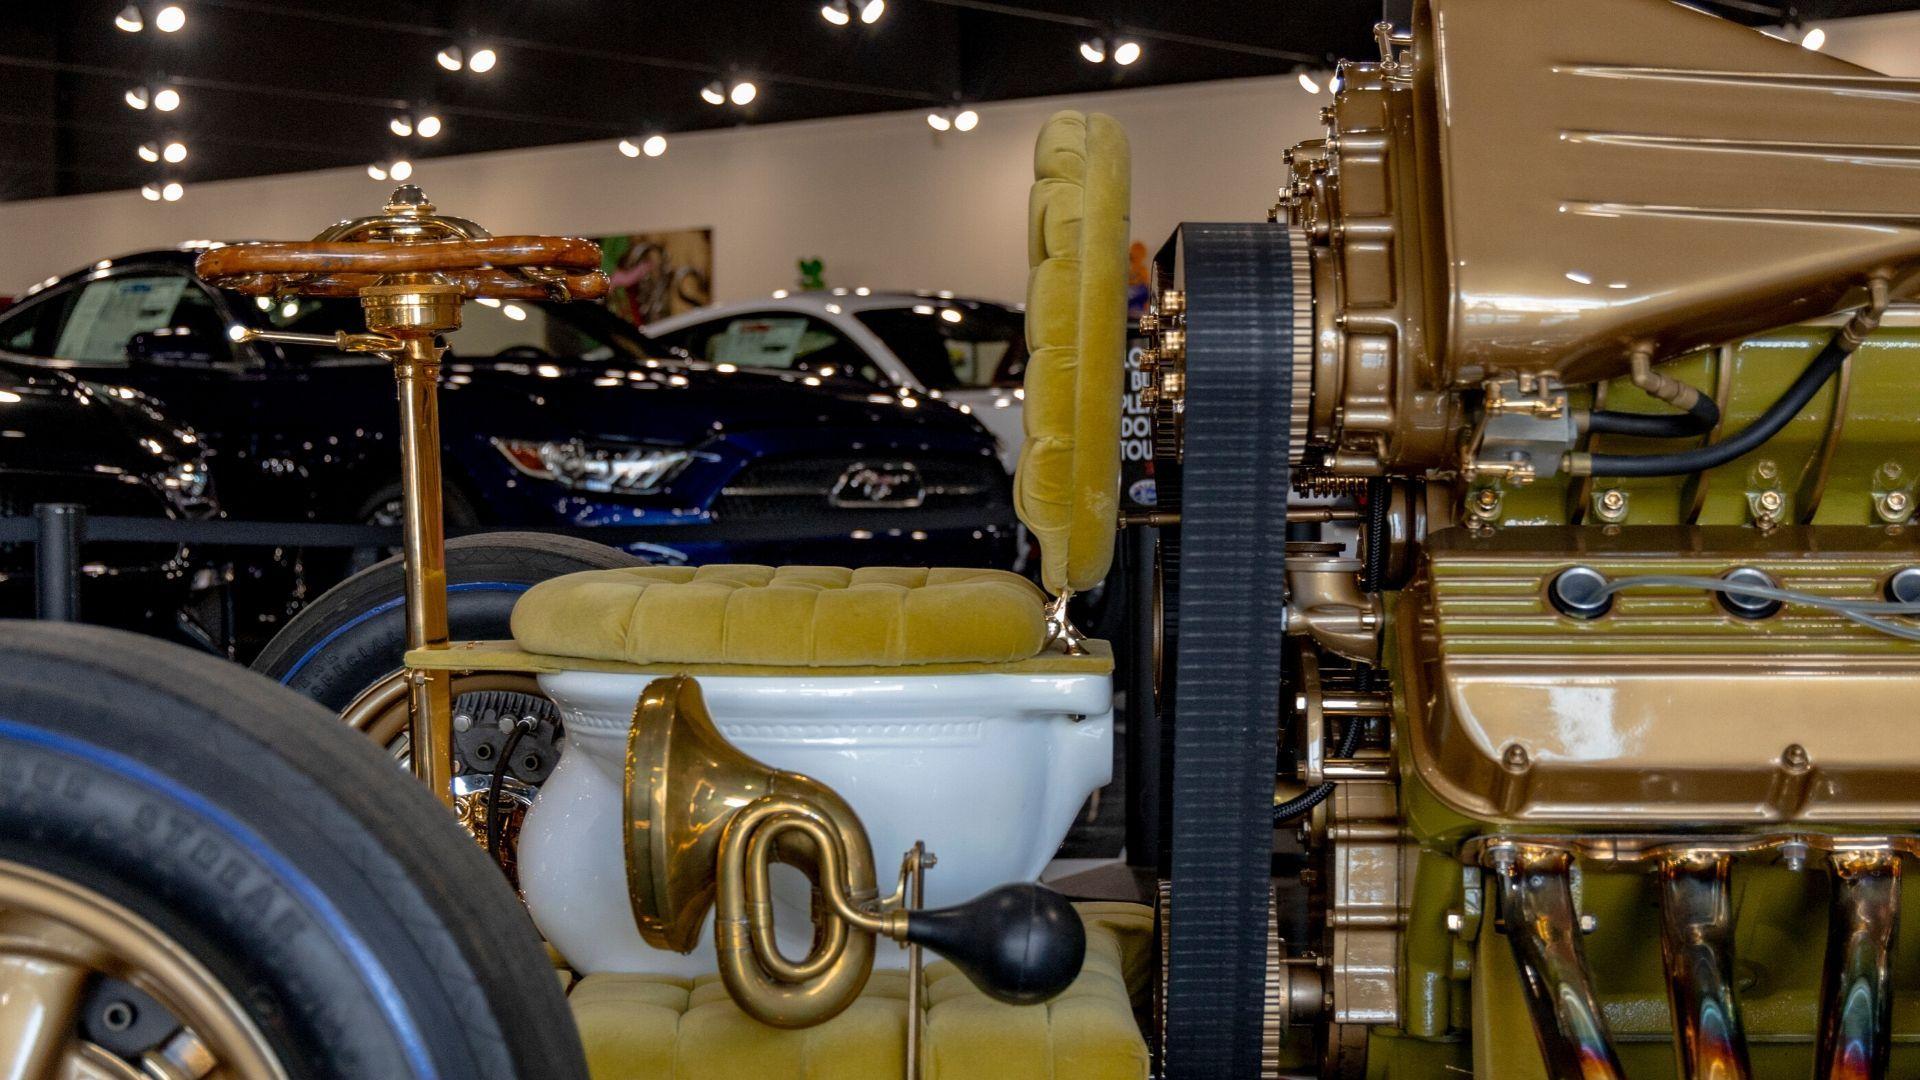 Car Kings Restore Fabled Bathtub Hot Rod